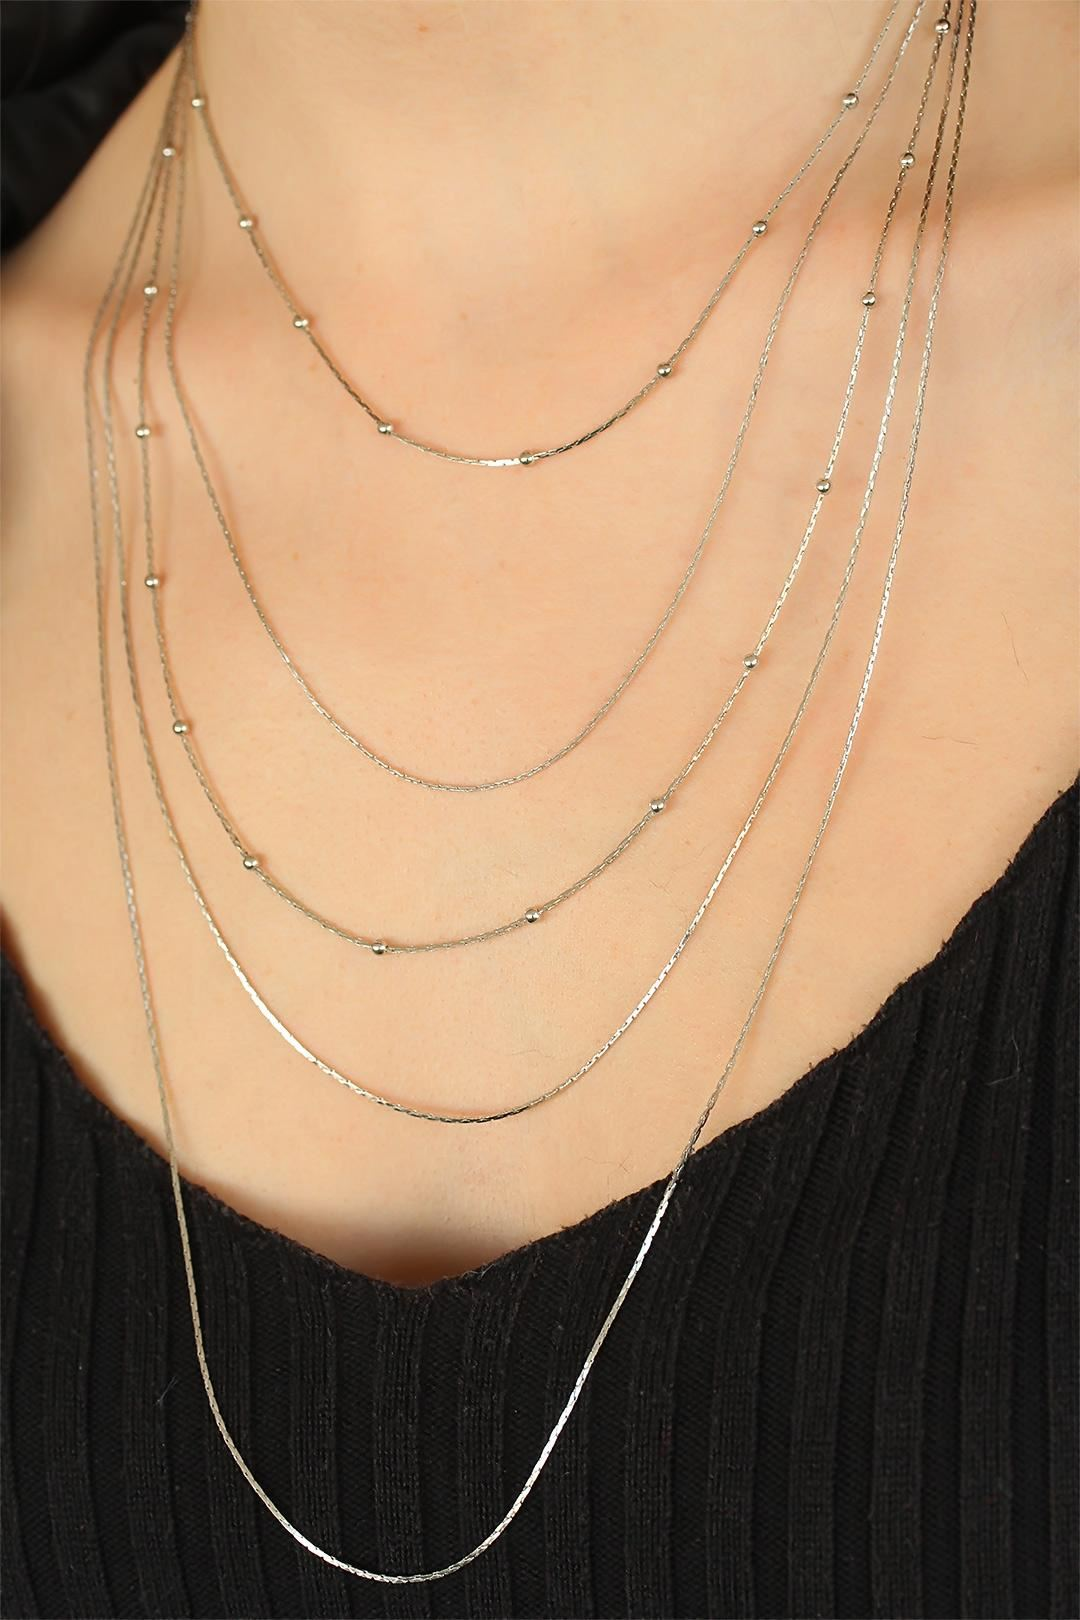 Silver Renk Zincirli Bayan Çoklu Kolye